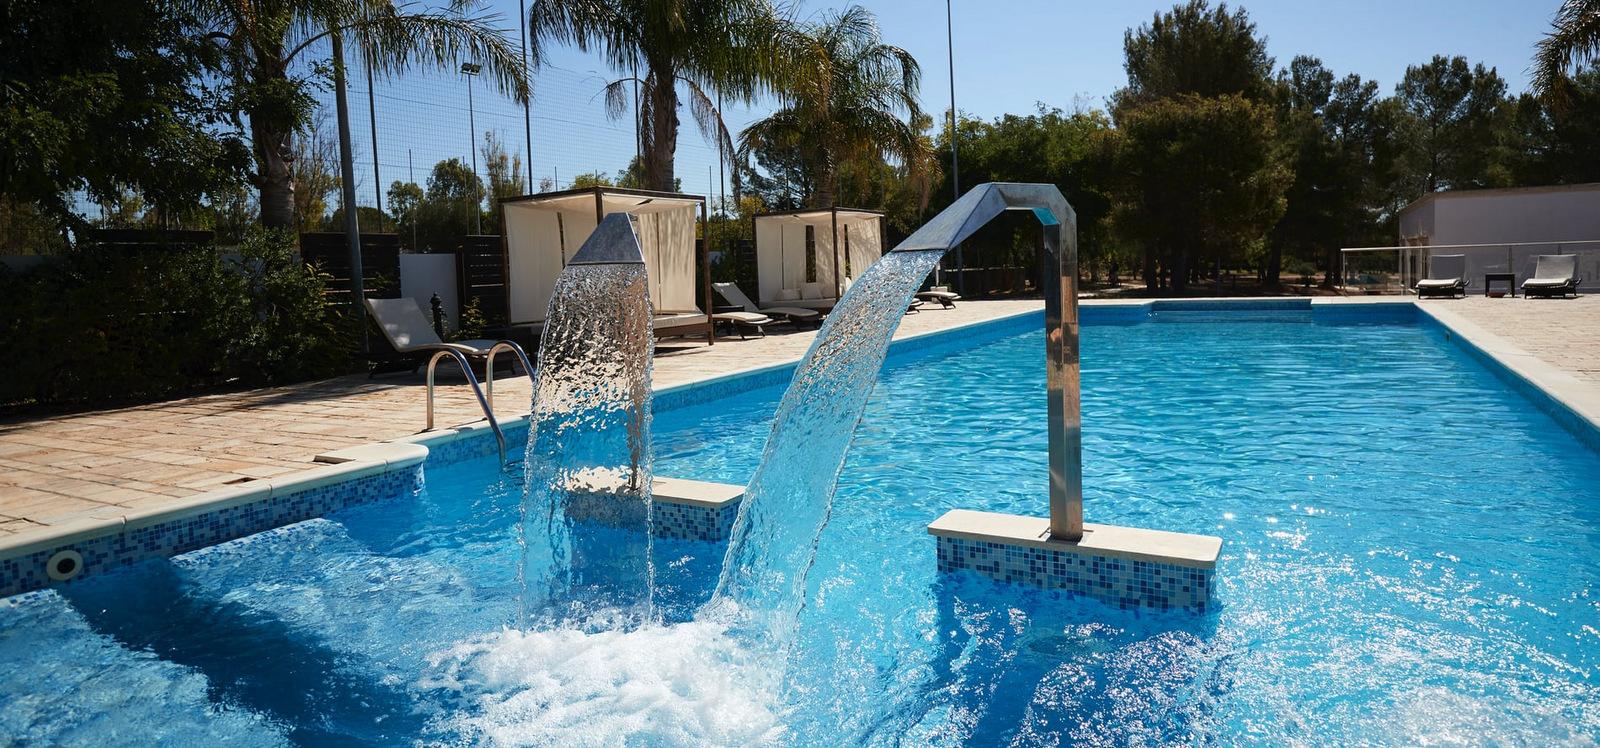 Jorche masseria piscina